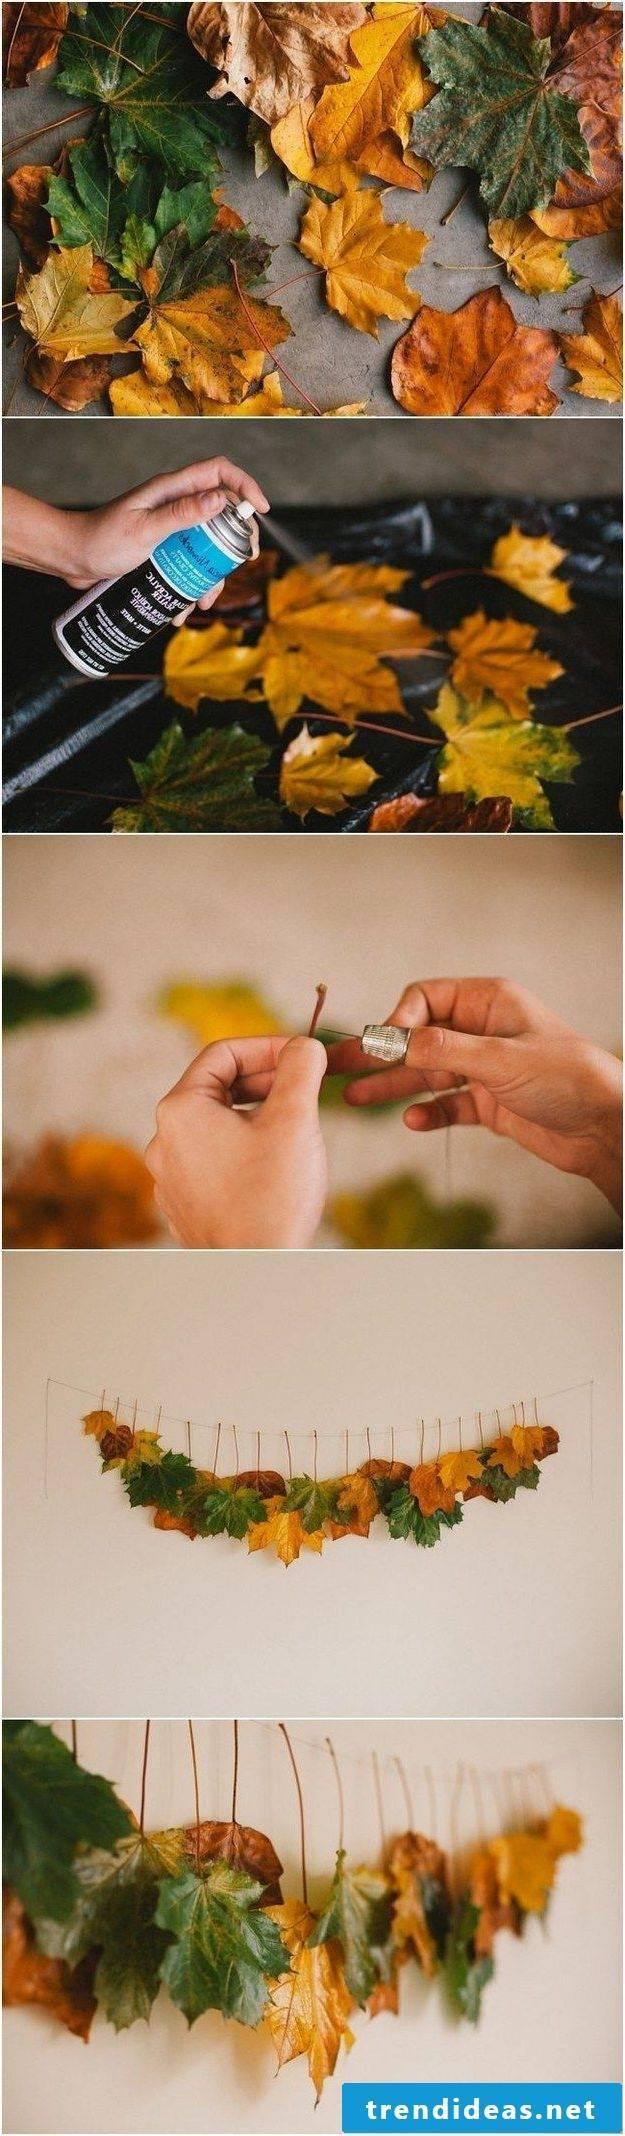 Decorative table autumn leaves